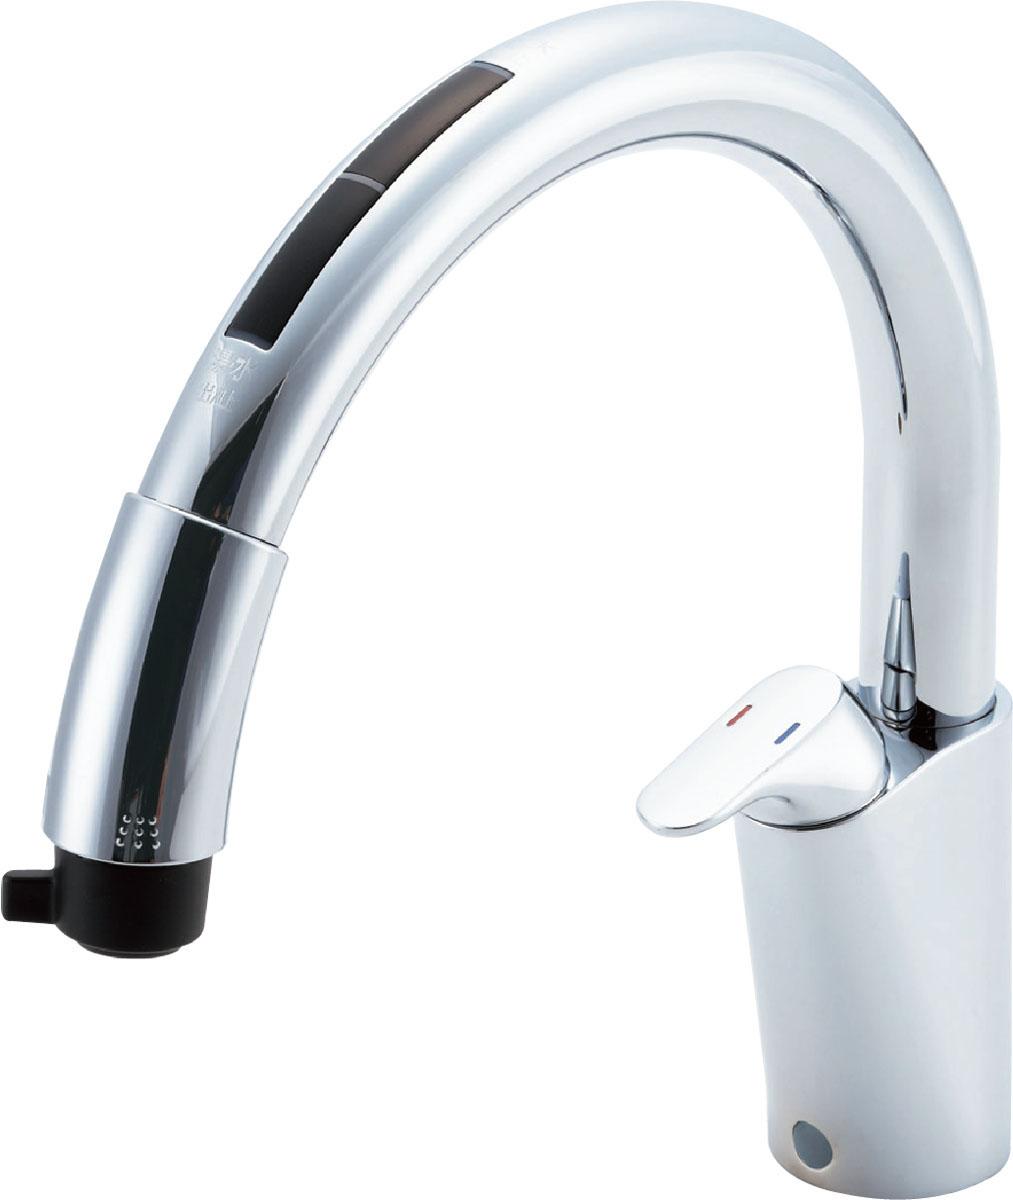 INAX LIXIL キッチン水栓 JF-NB464SX (JW) キッチン用タッチレス水栓 ナビッシュ (浄水器ビルトイン型) 乾電池式B6タイプ イナックス リクシル